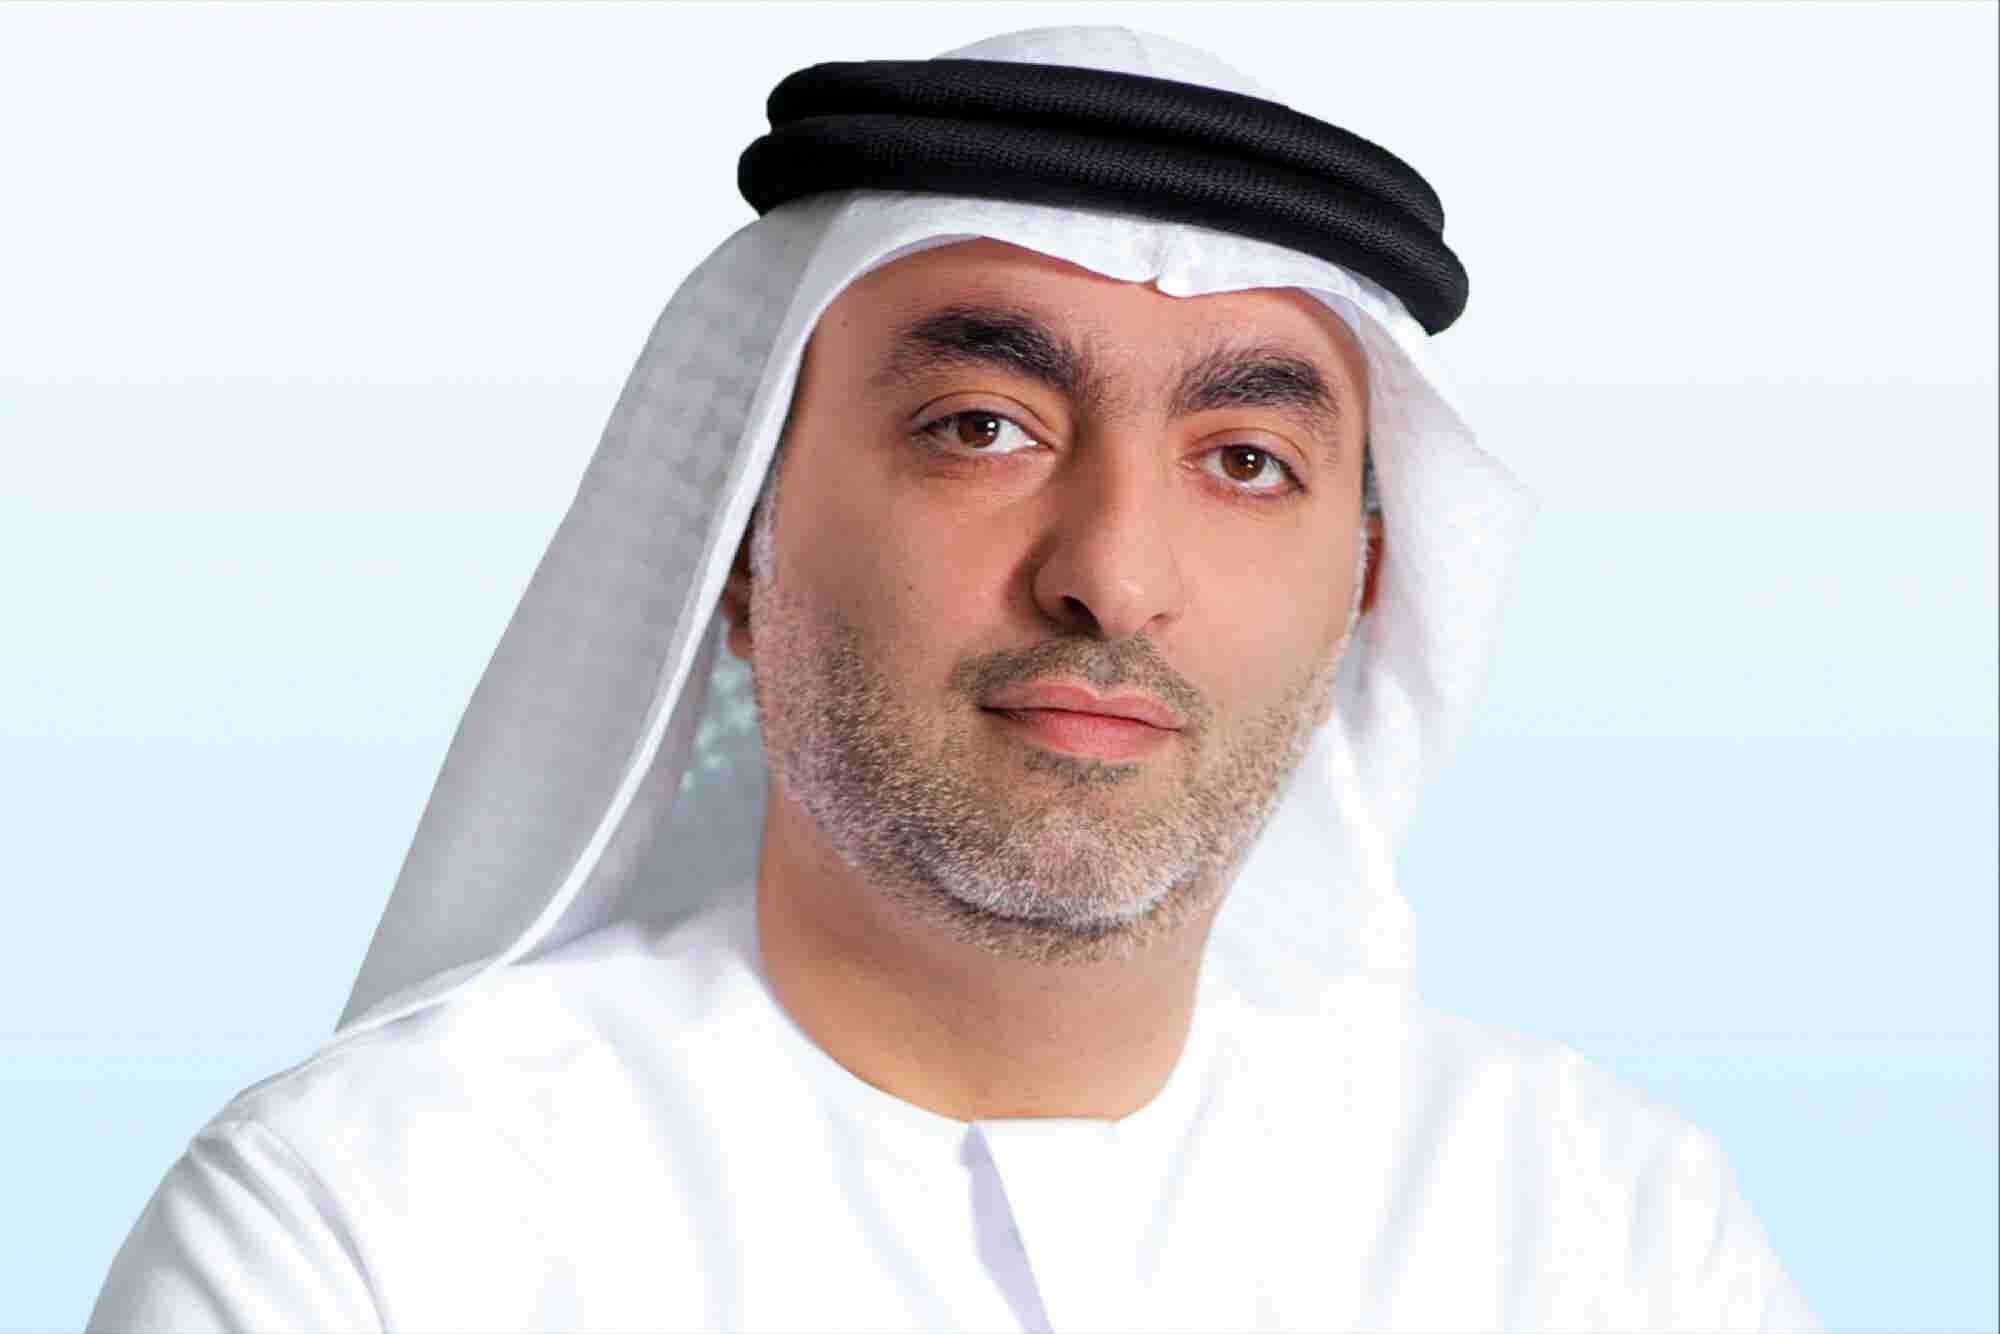 Ras Al Khaimah Aims To Attract Investors With The New RAK Economic Zon...